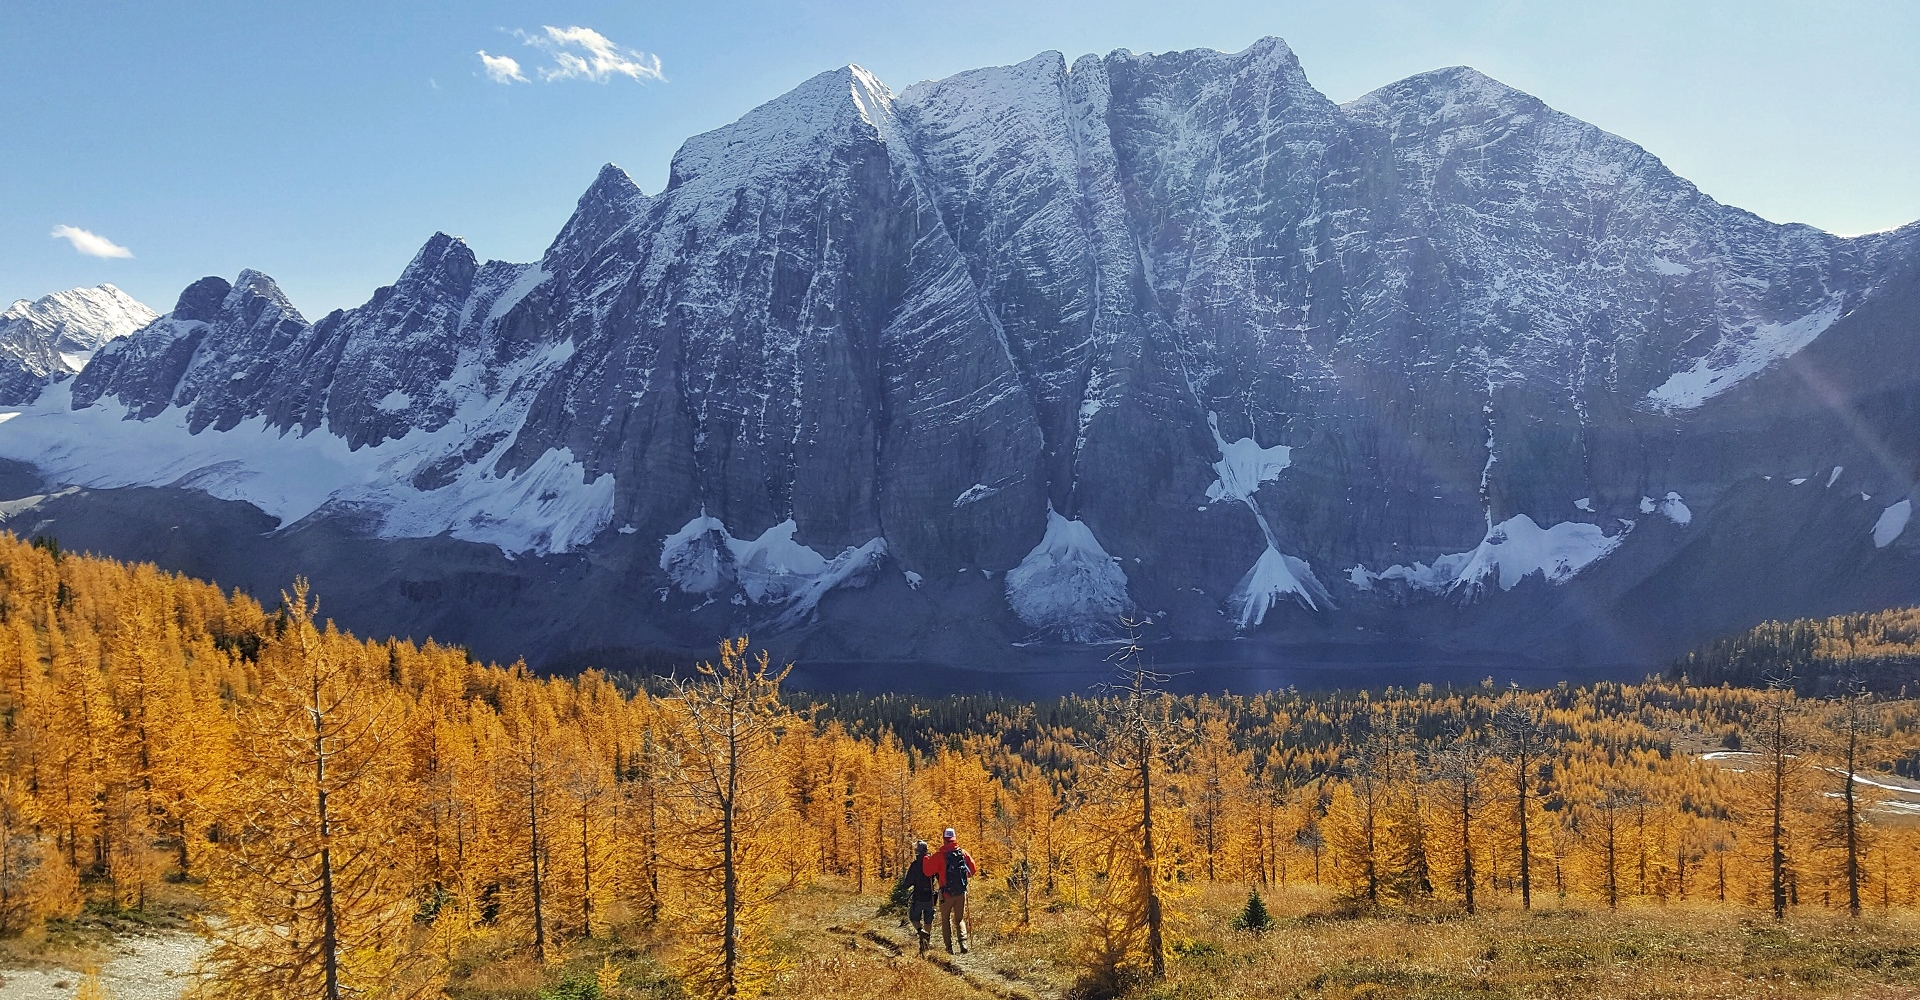 Kootenay National Park | Kristi Nicholson